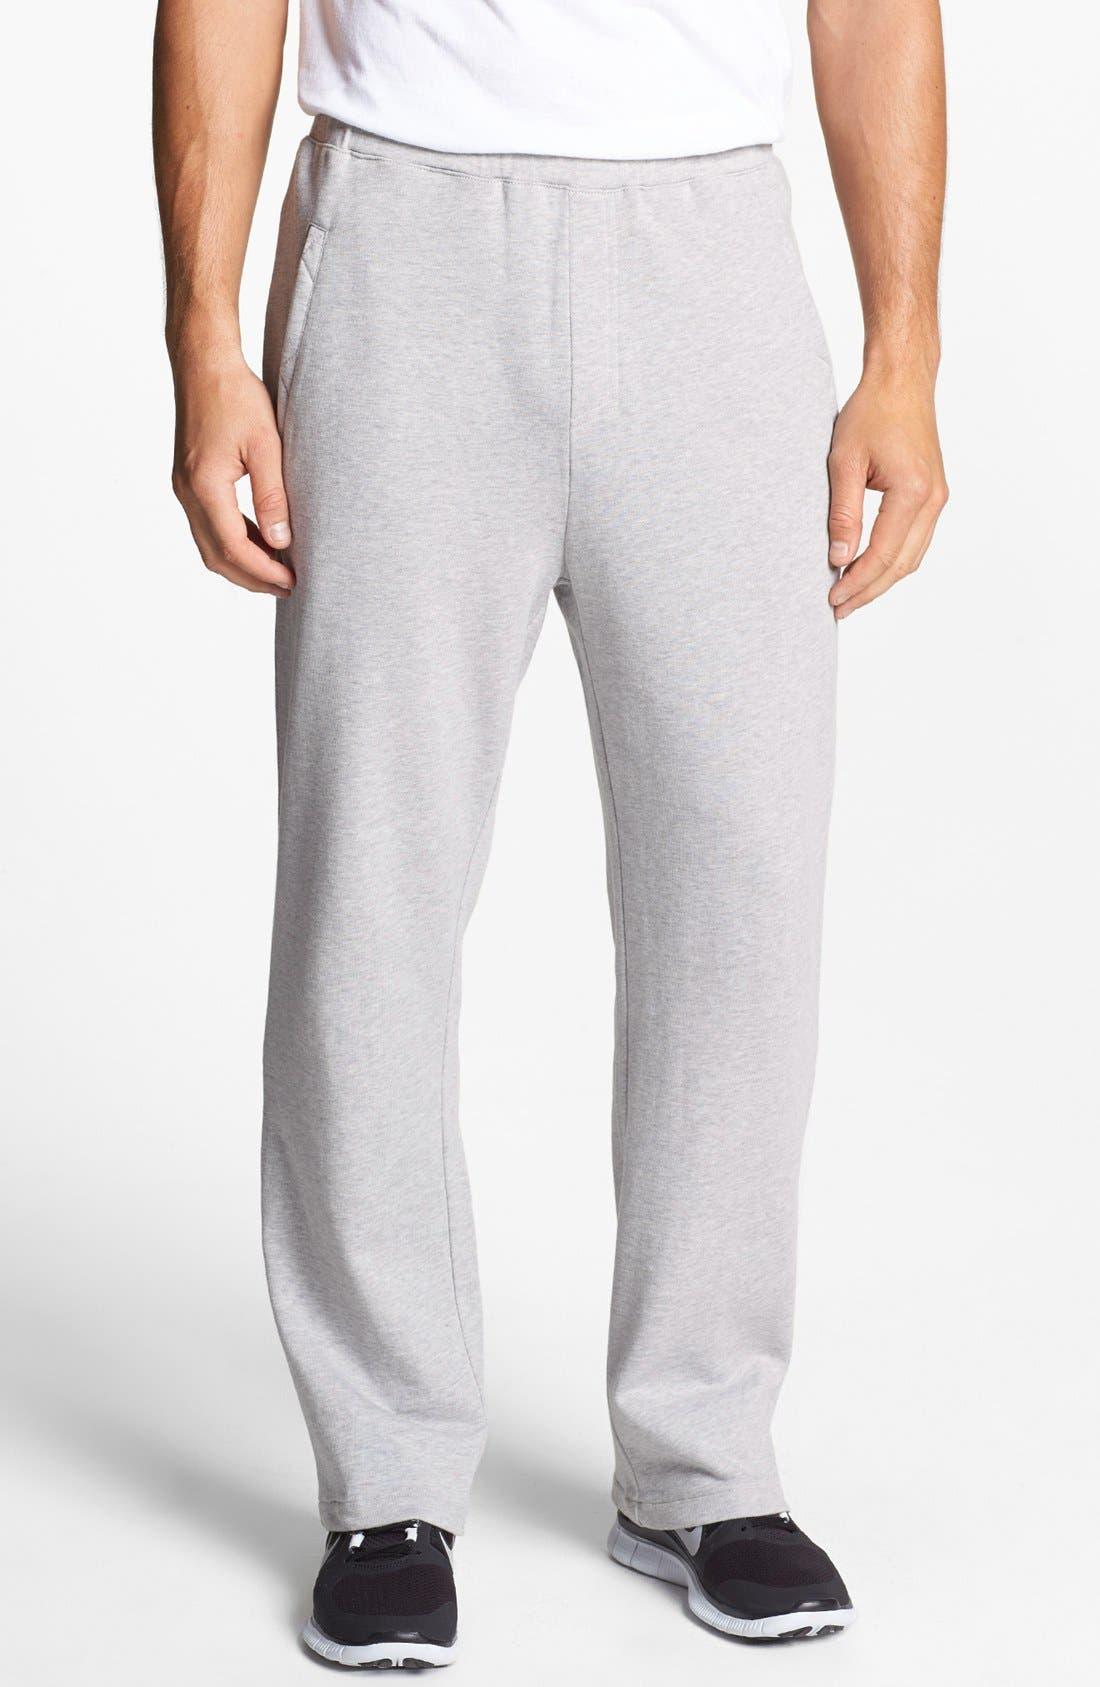 Main Image - BOSS HUGO BOSS 'Innovation 6' Lounge Pants